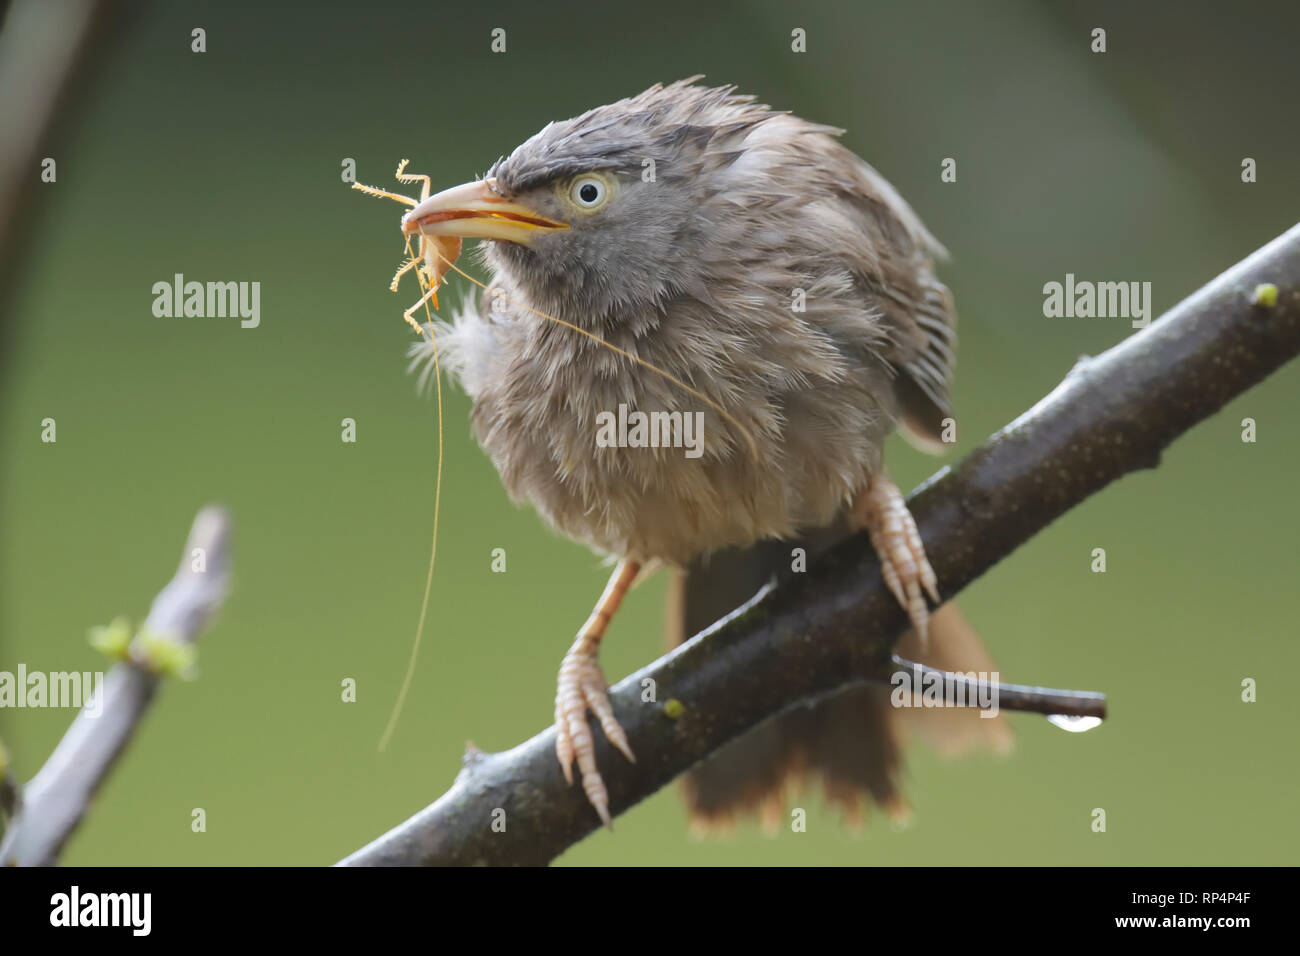 Jungle Babbler (Argya striata ) eating a cricket - Stock Image